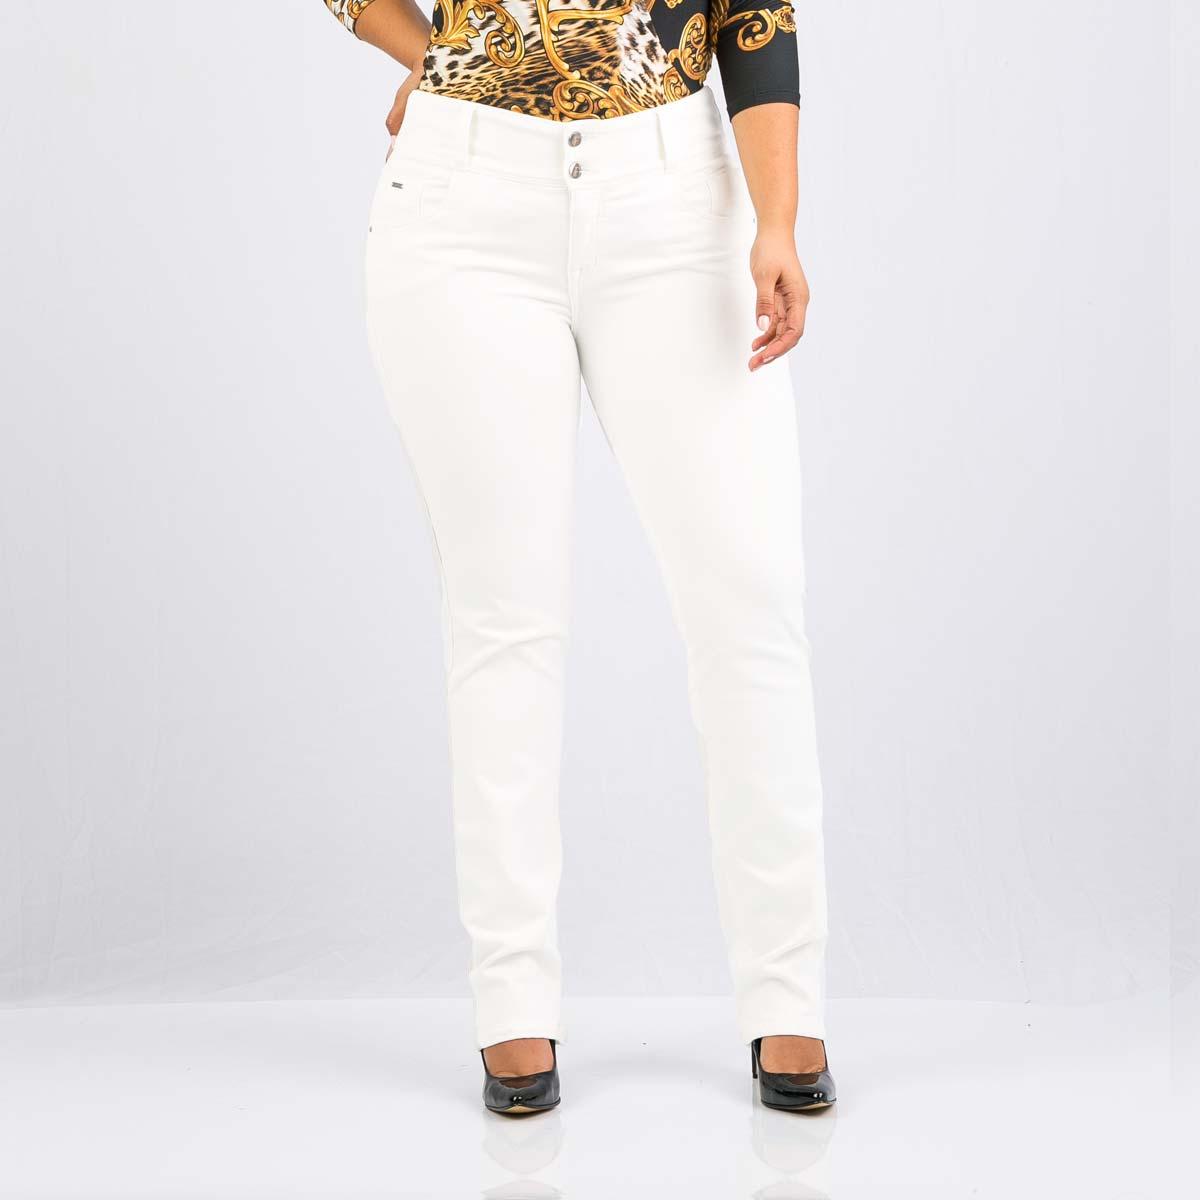 0a23a99778 Pantalón blanco bota recta para mujer Farichi Studio tiene una  característica